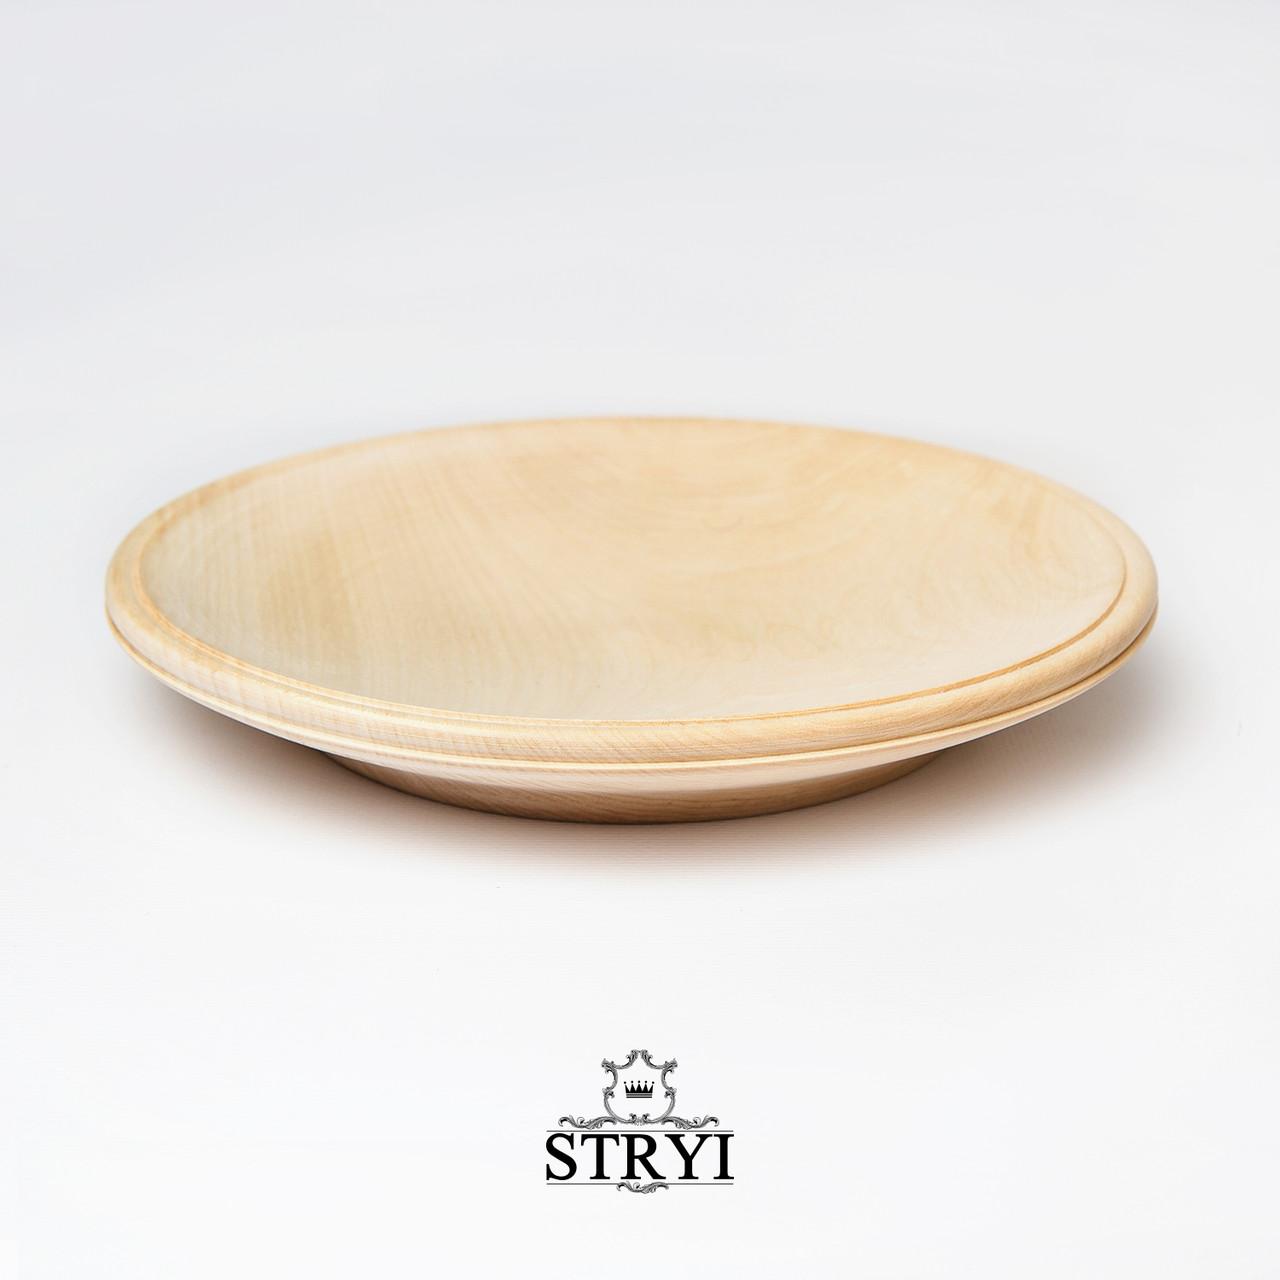 Тарелка для резьбы, заготовка, липа 240 мм